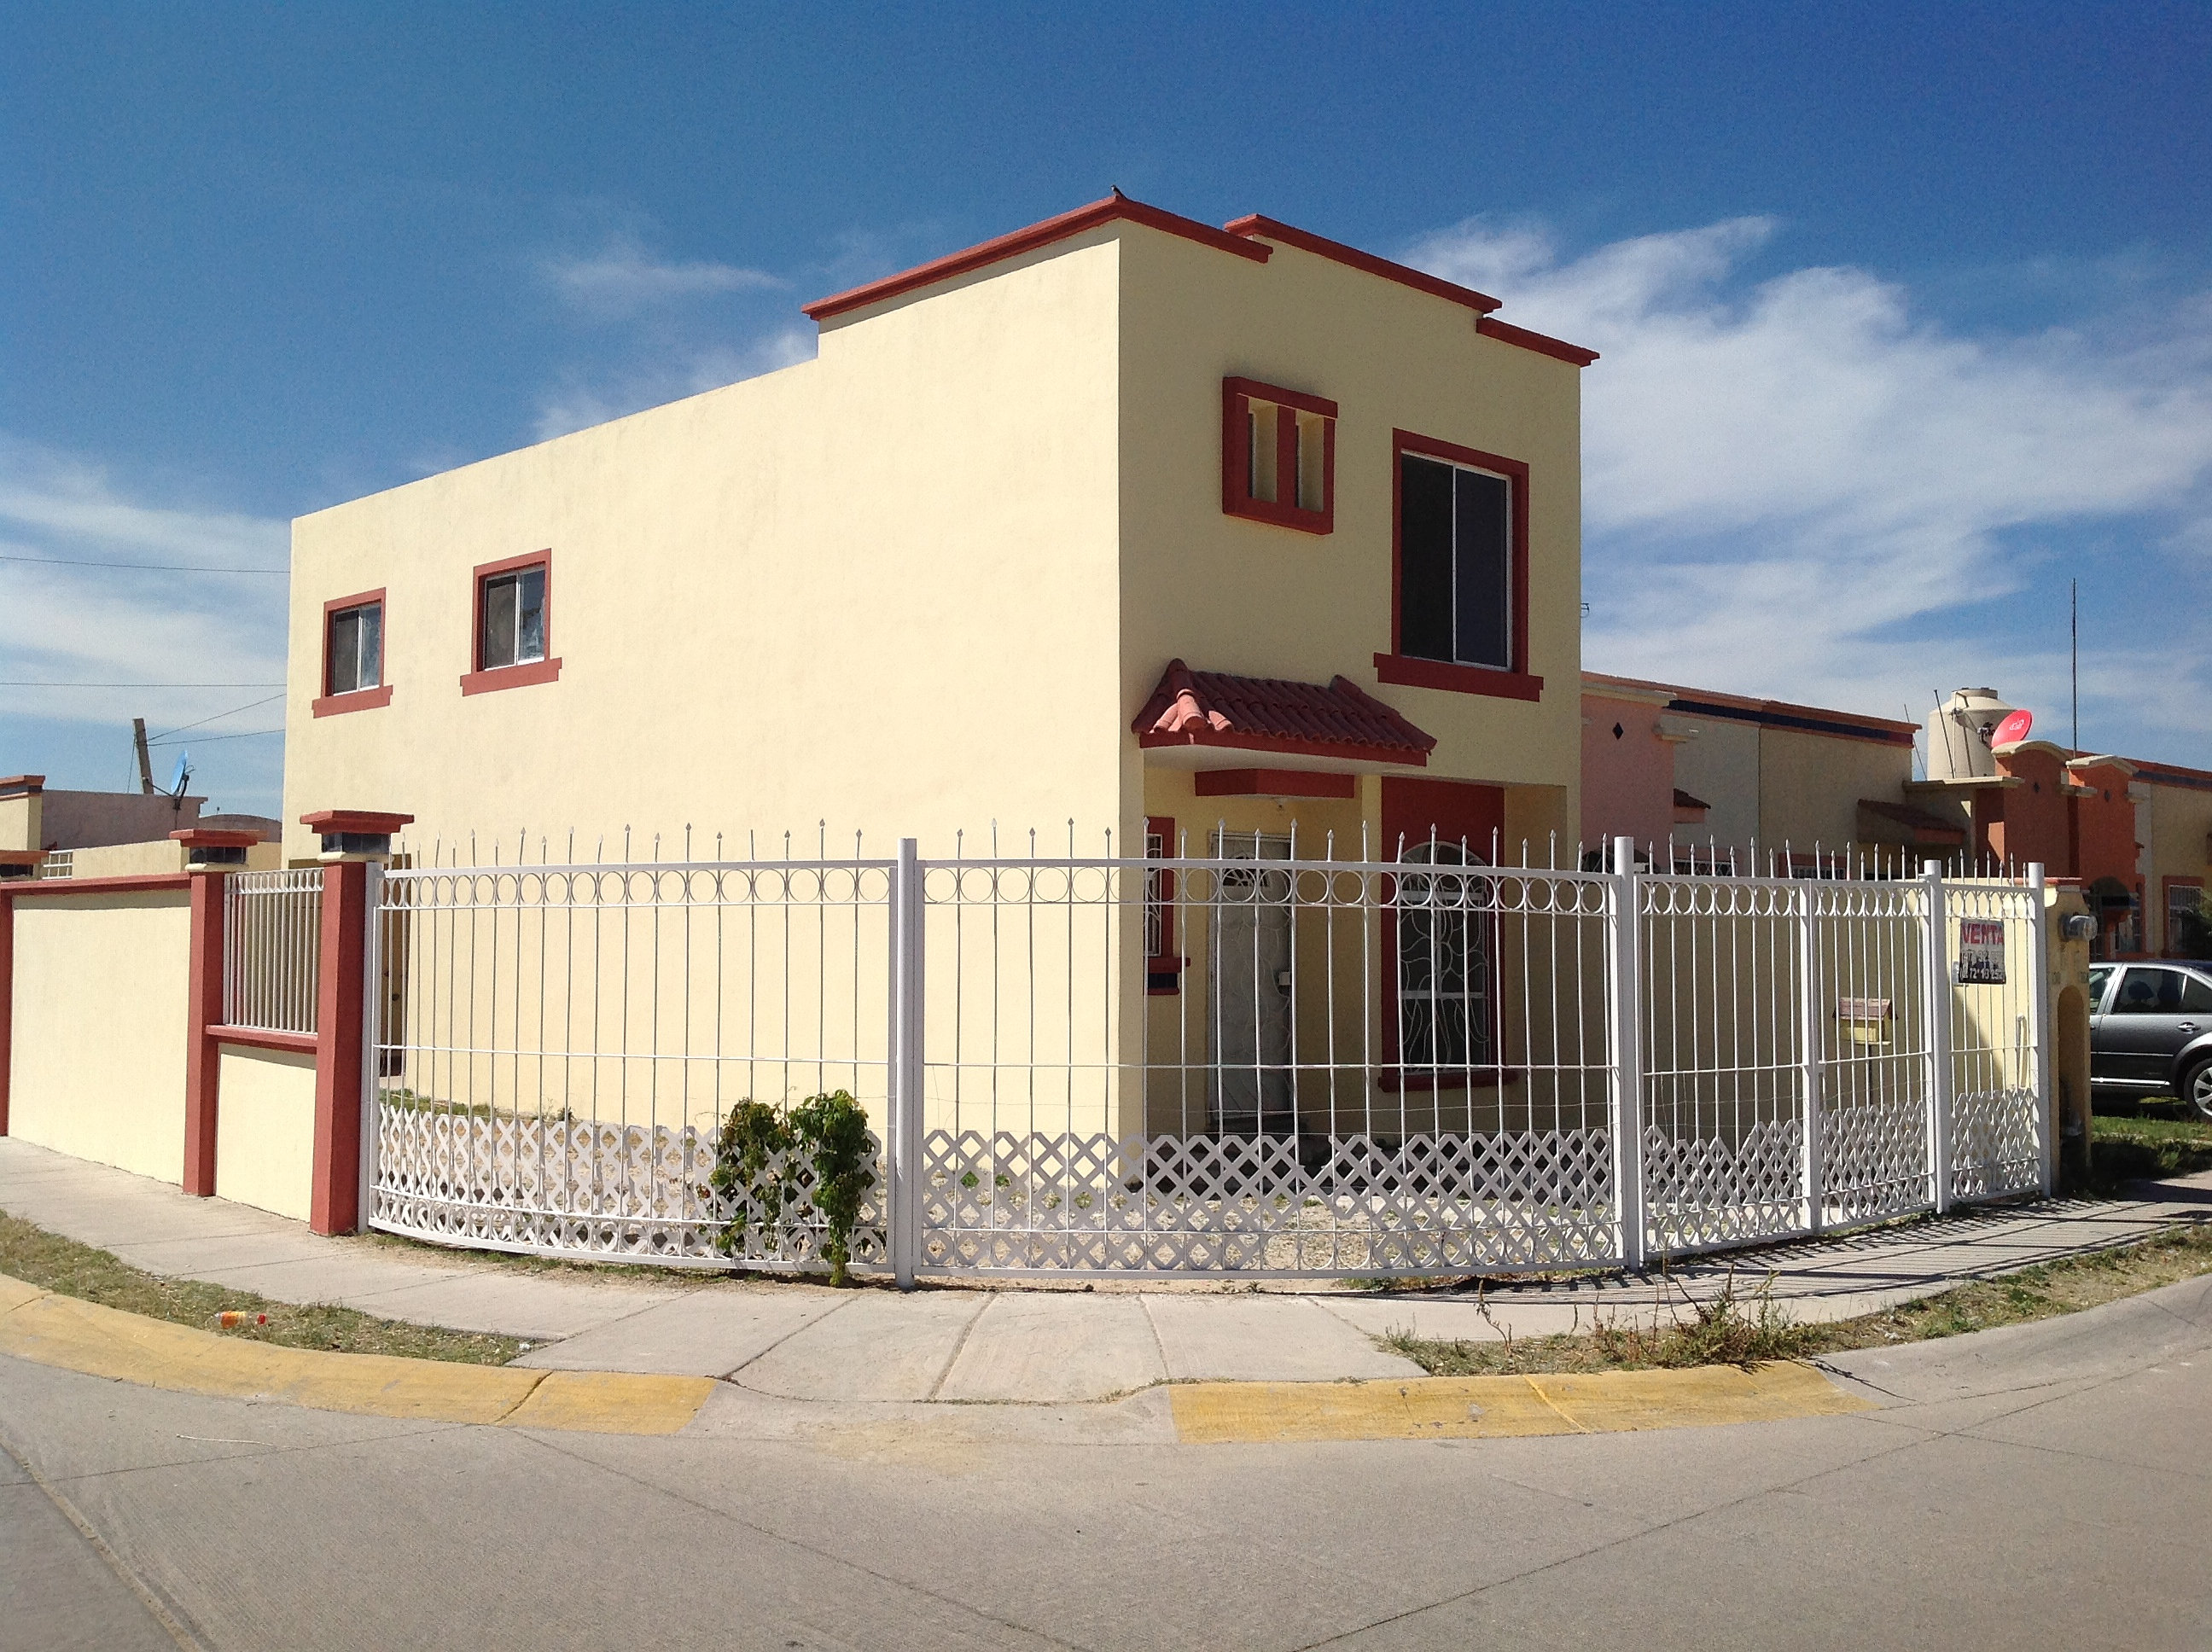 Mi casa ideal inmobiliaria leon gto mexico renta casa for Casa en renta gran jardin leon gto